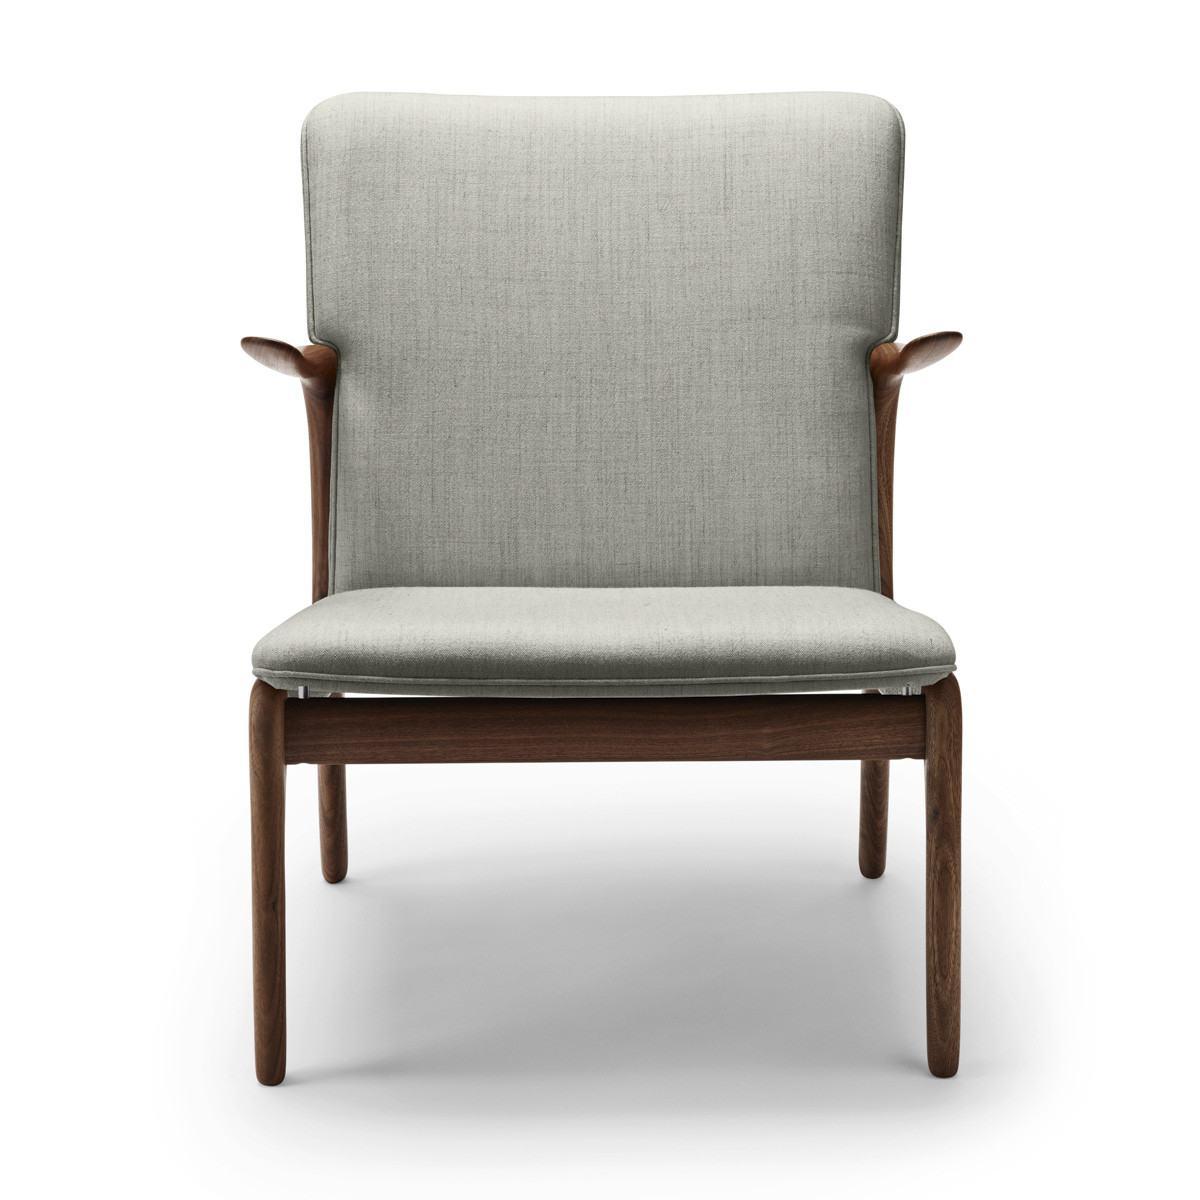 Carl Hansen OW124 Beak Chair - Oiled Walnut